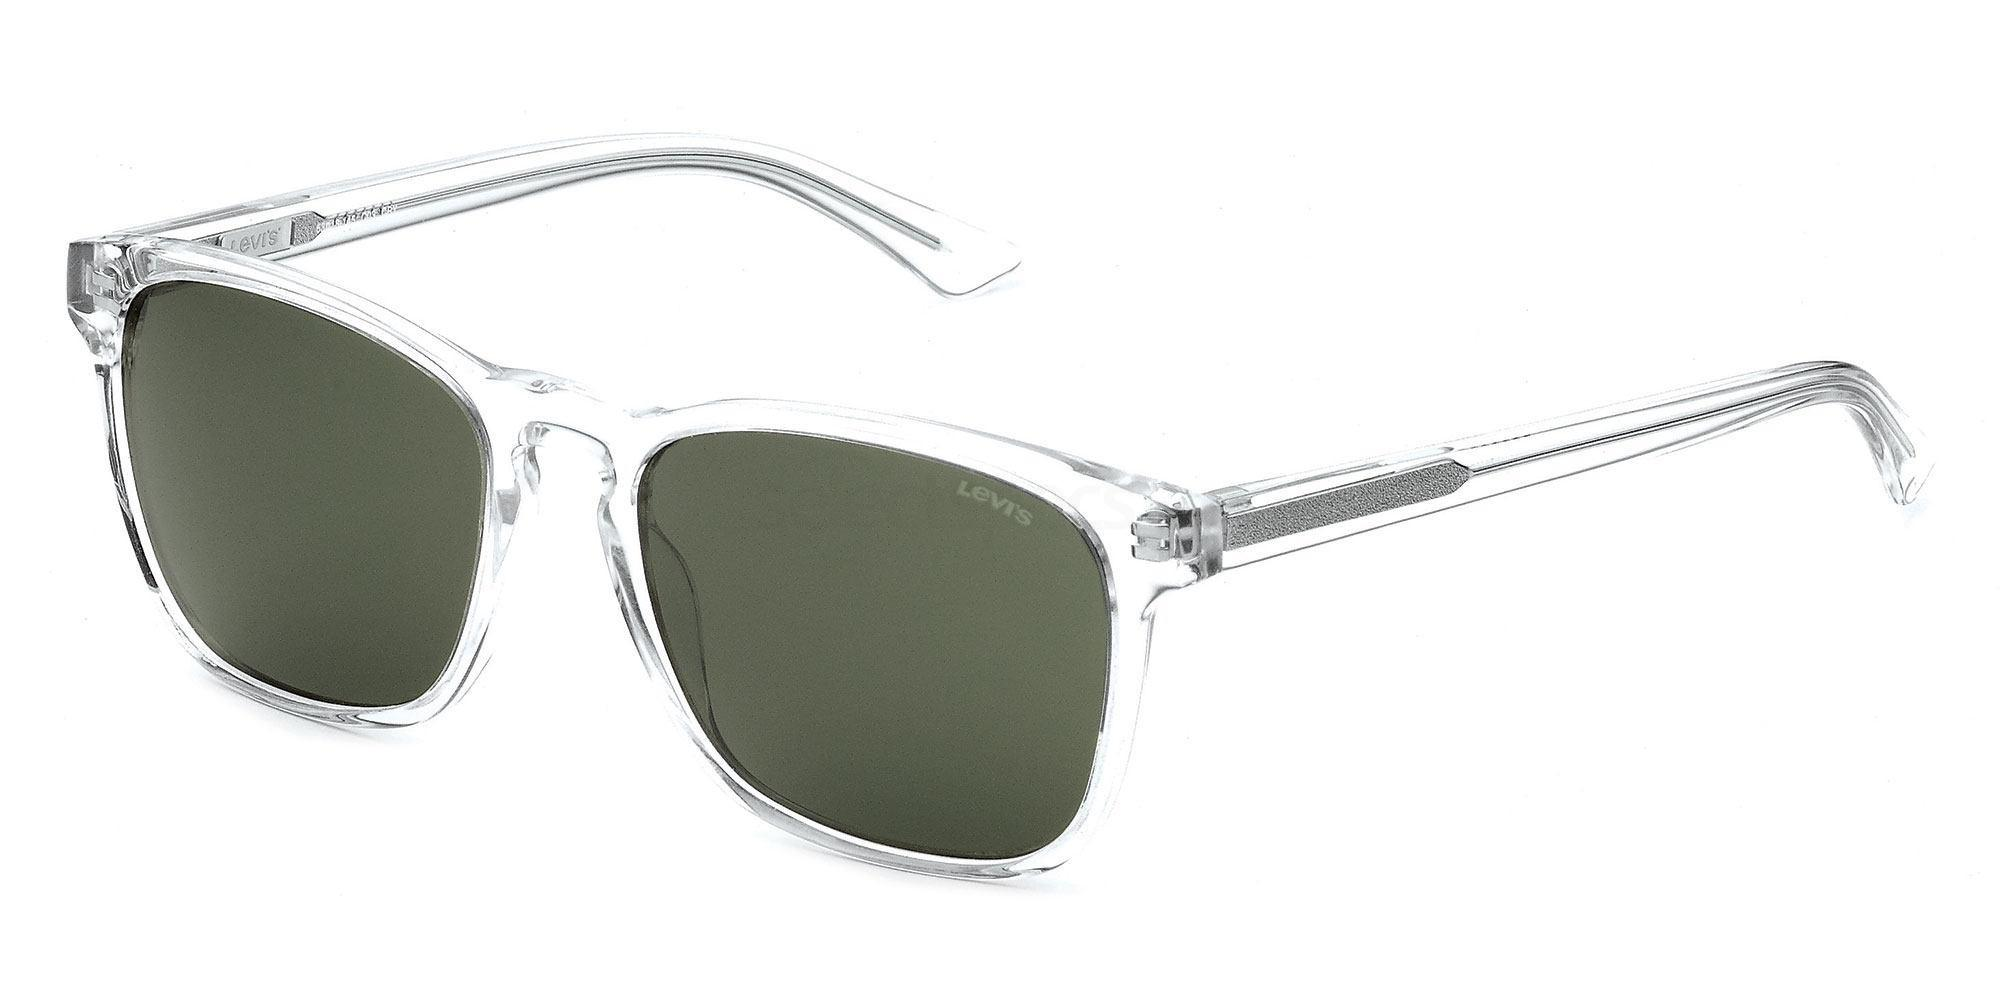 Levi Eyewear LO2246 sunglasses